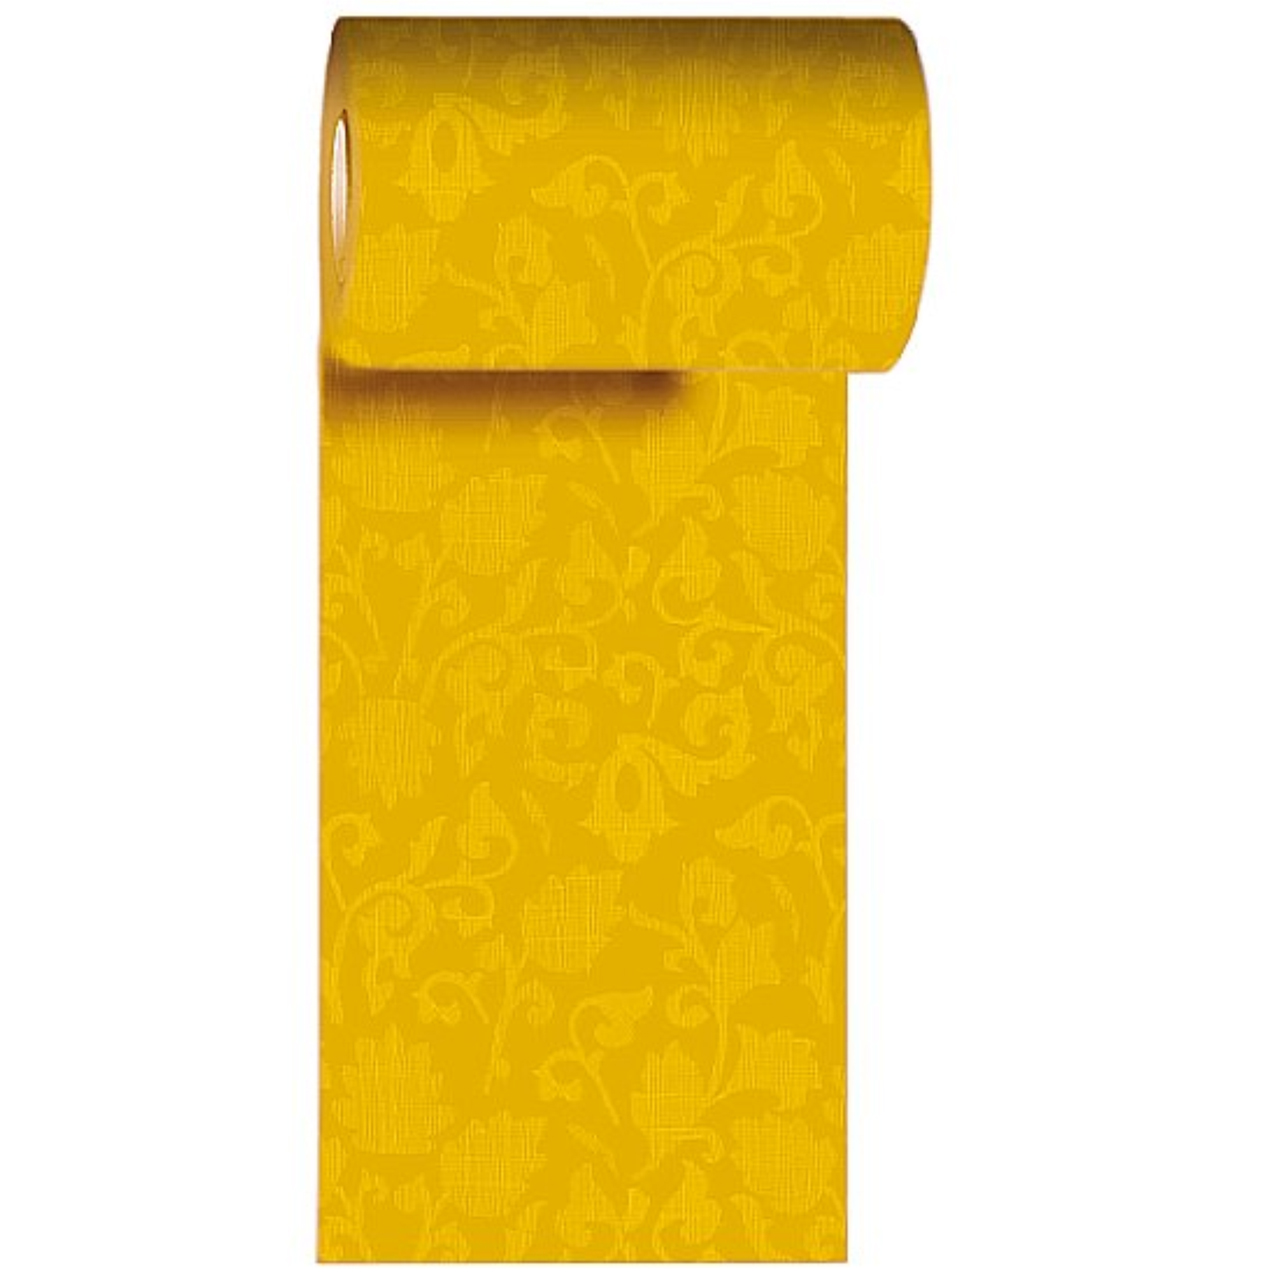 Napron in rola din hartie galbena cu flori 200x15 cm chicville 2021